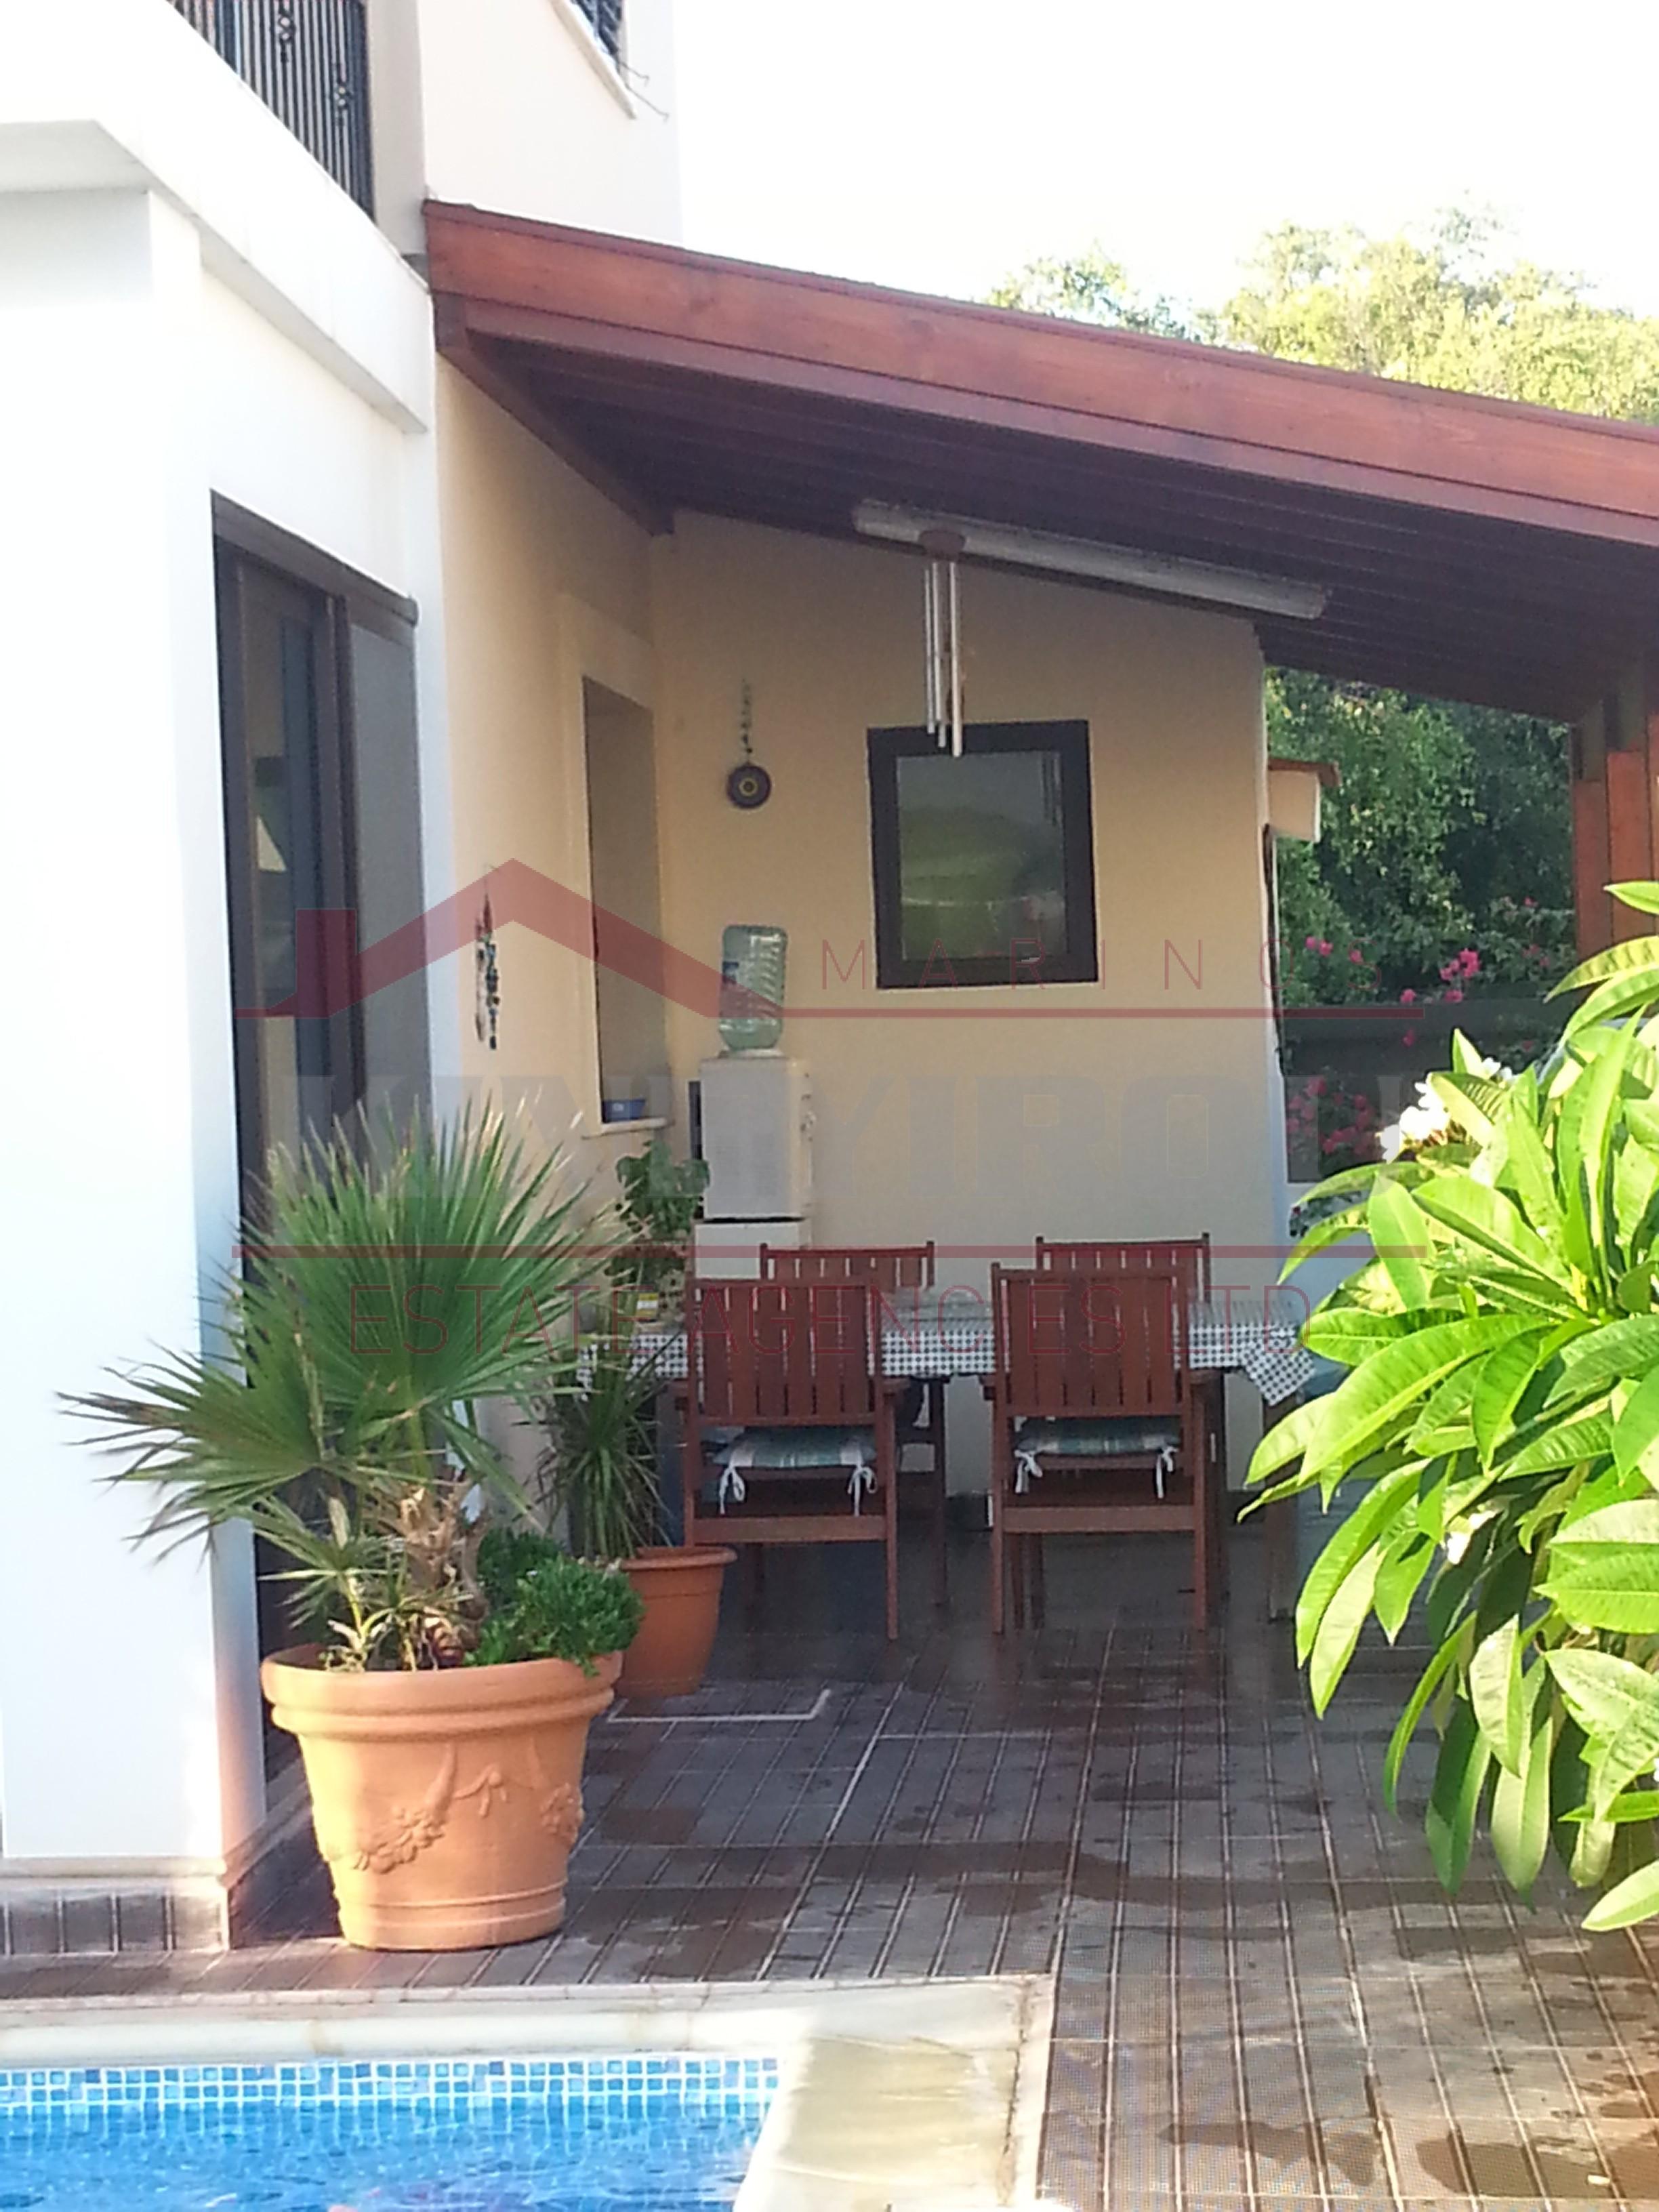 Luxury 4 bedroom house for sale in Perivolia, Larnaca